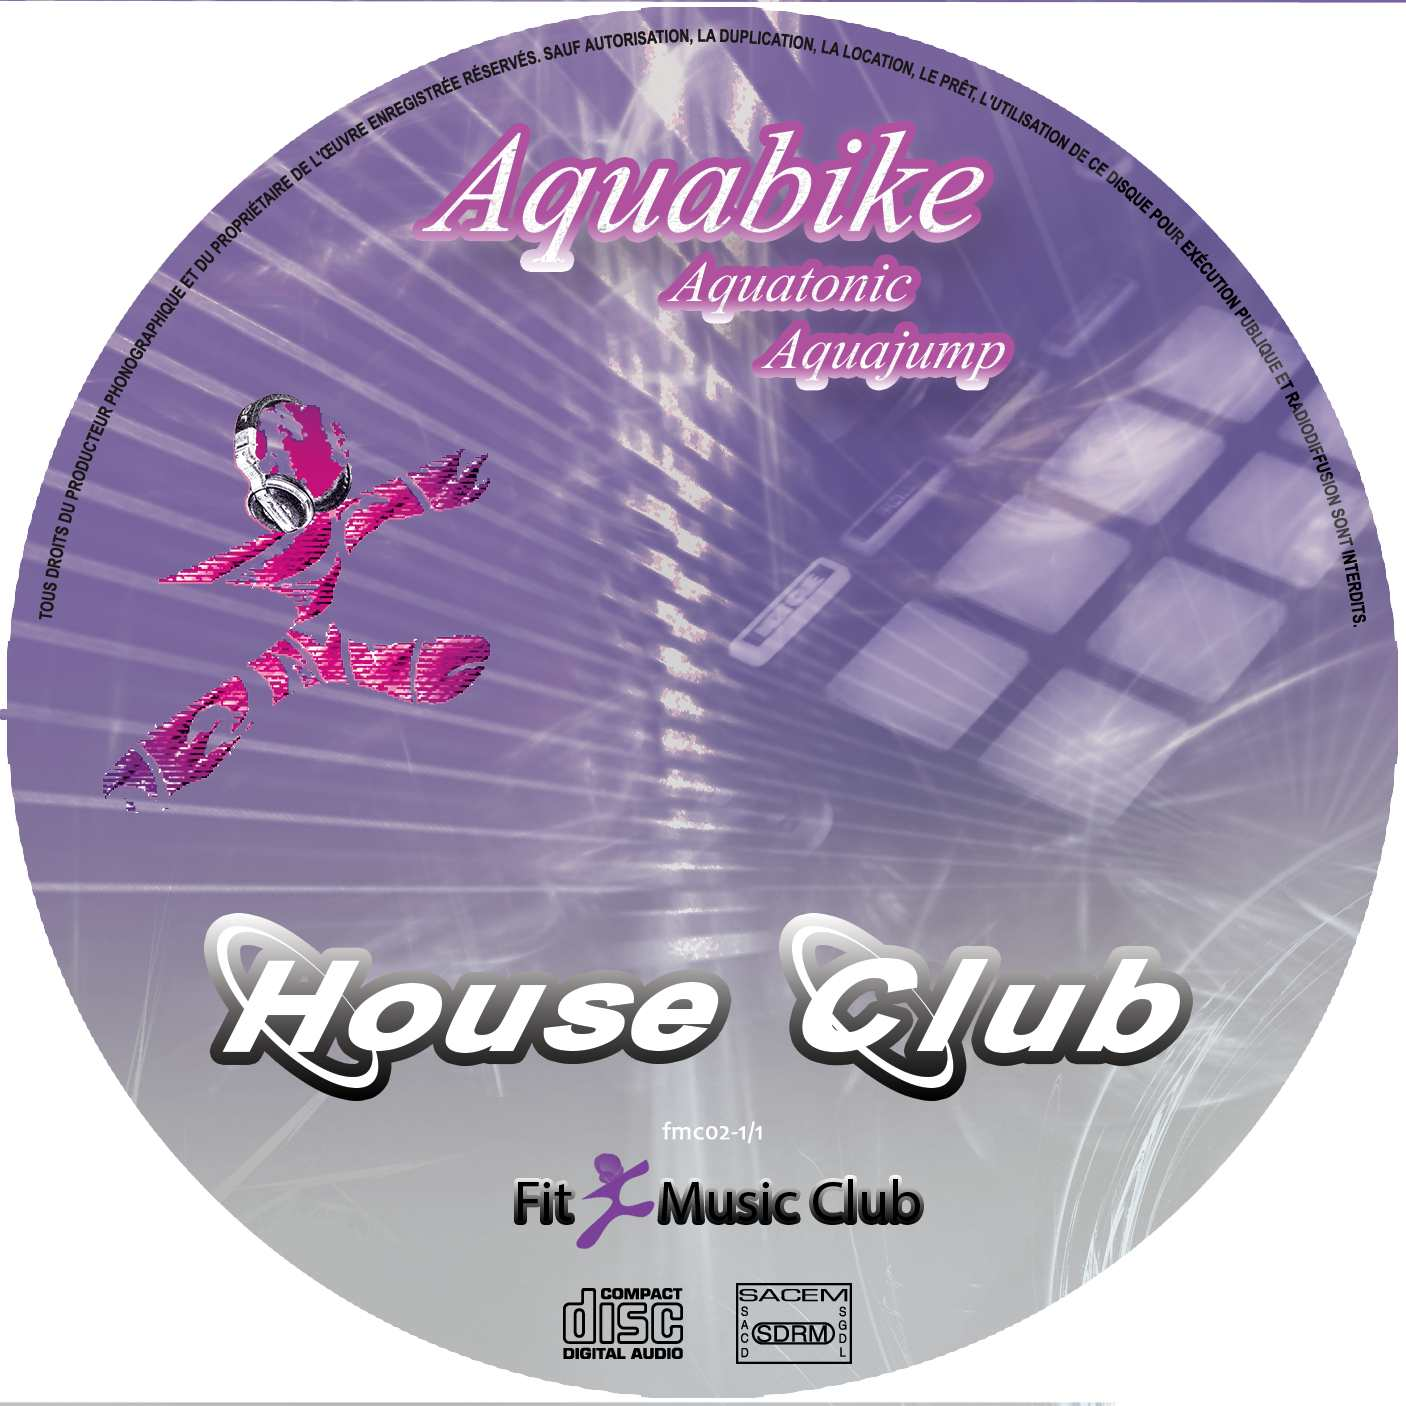 Cd House Club Aquabike